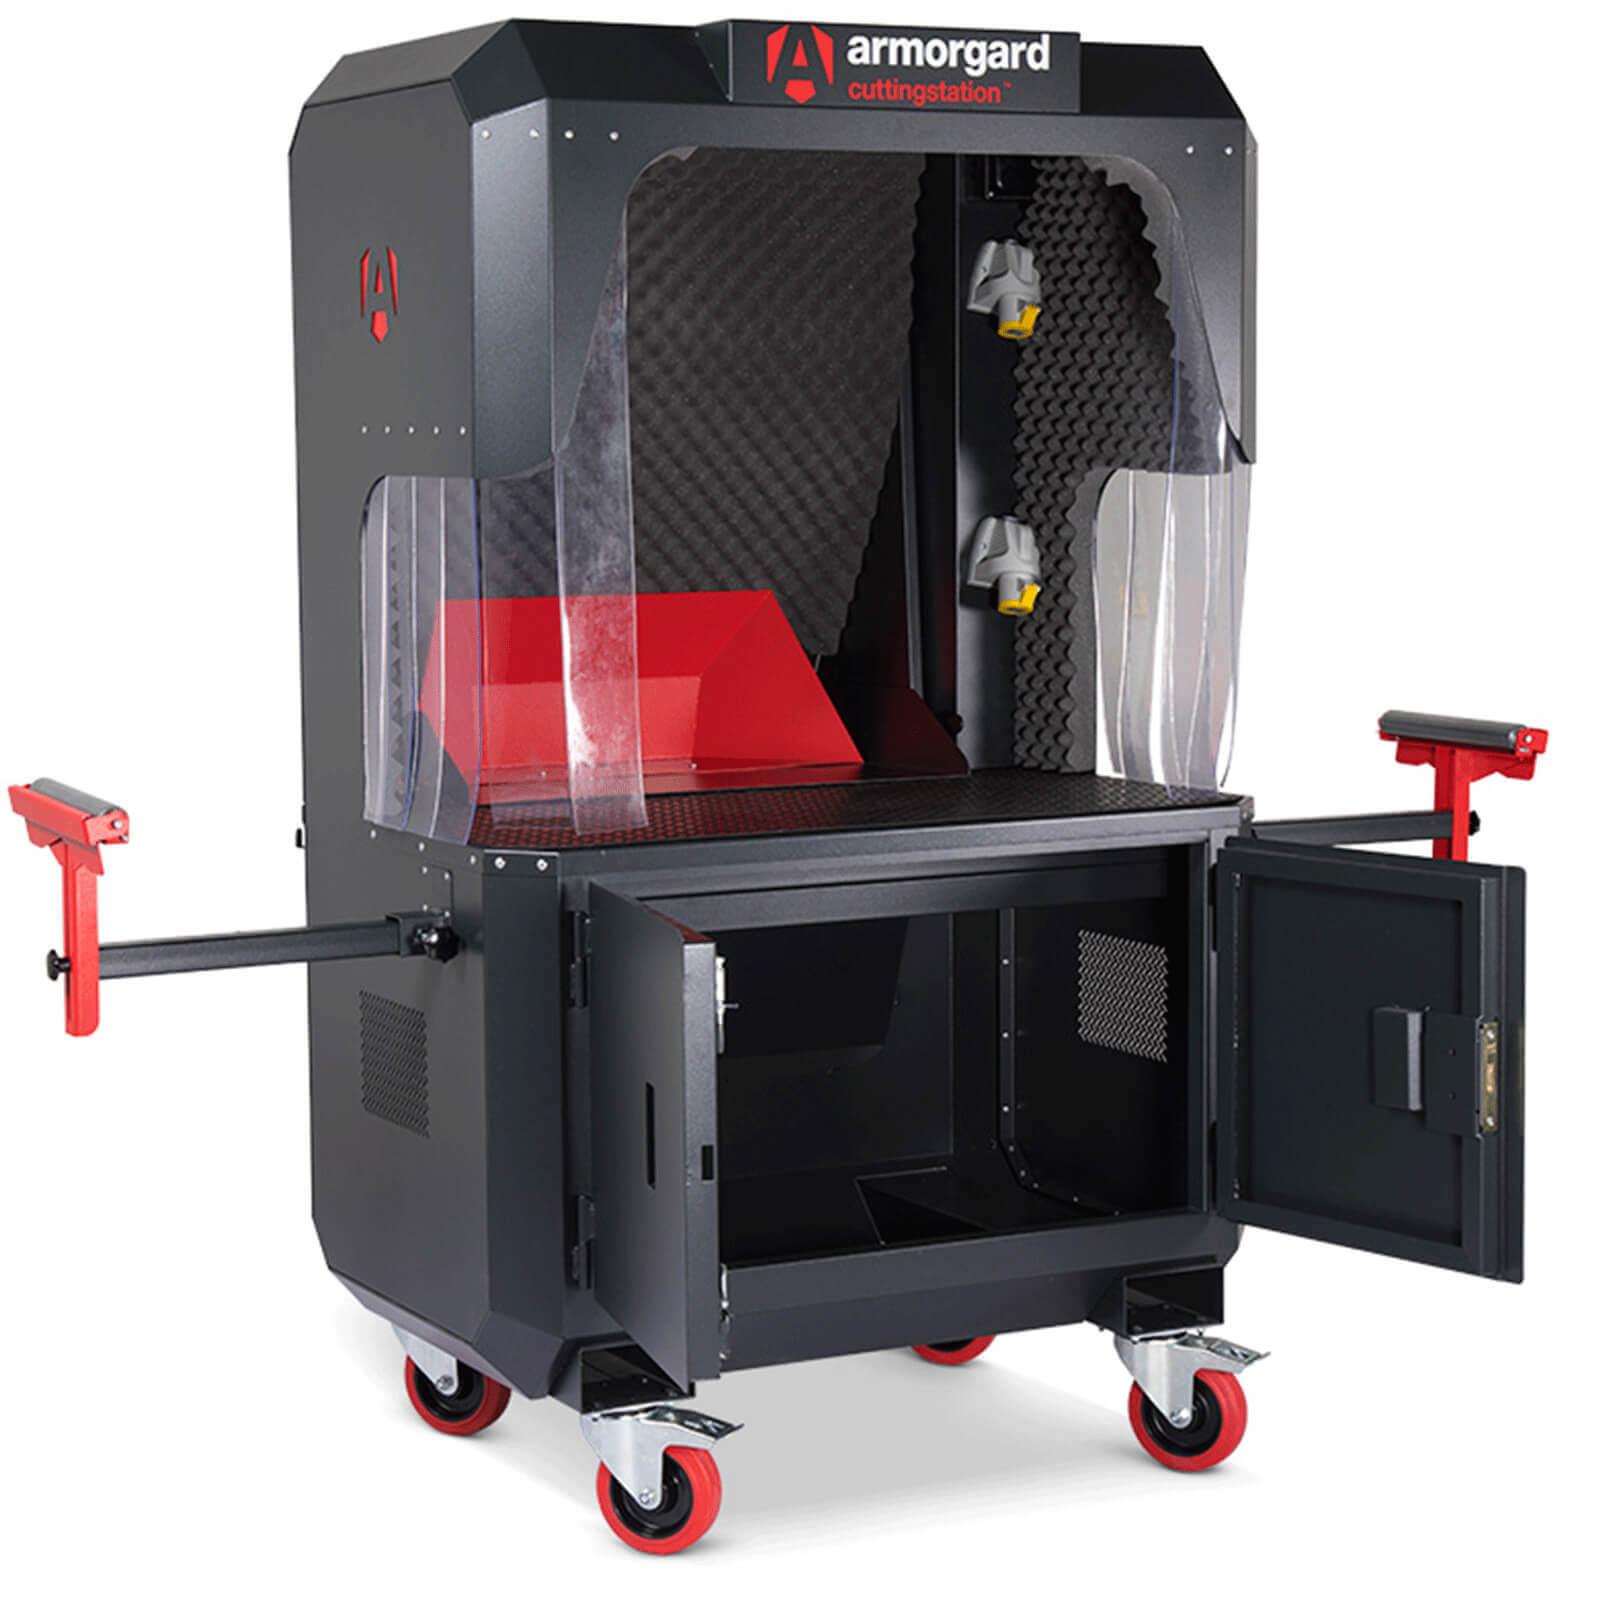 Image of Armorgard Cuttingstation Chopsaw Workstation 1.4m